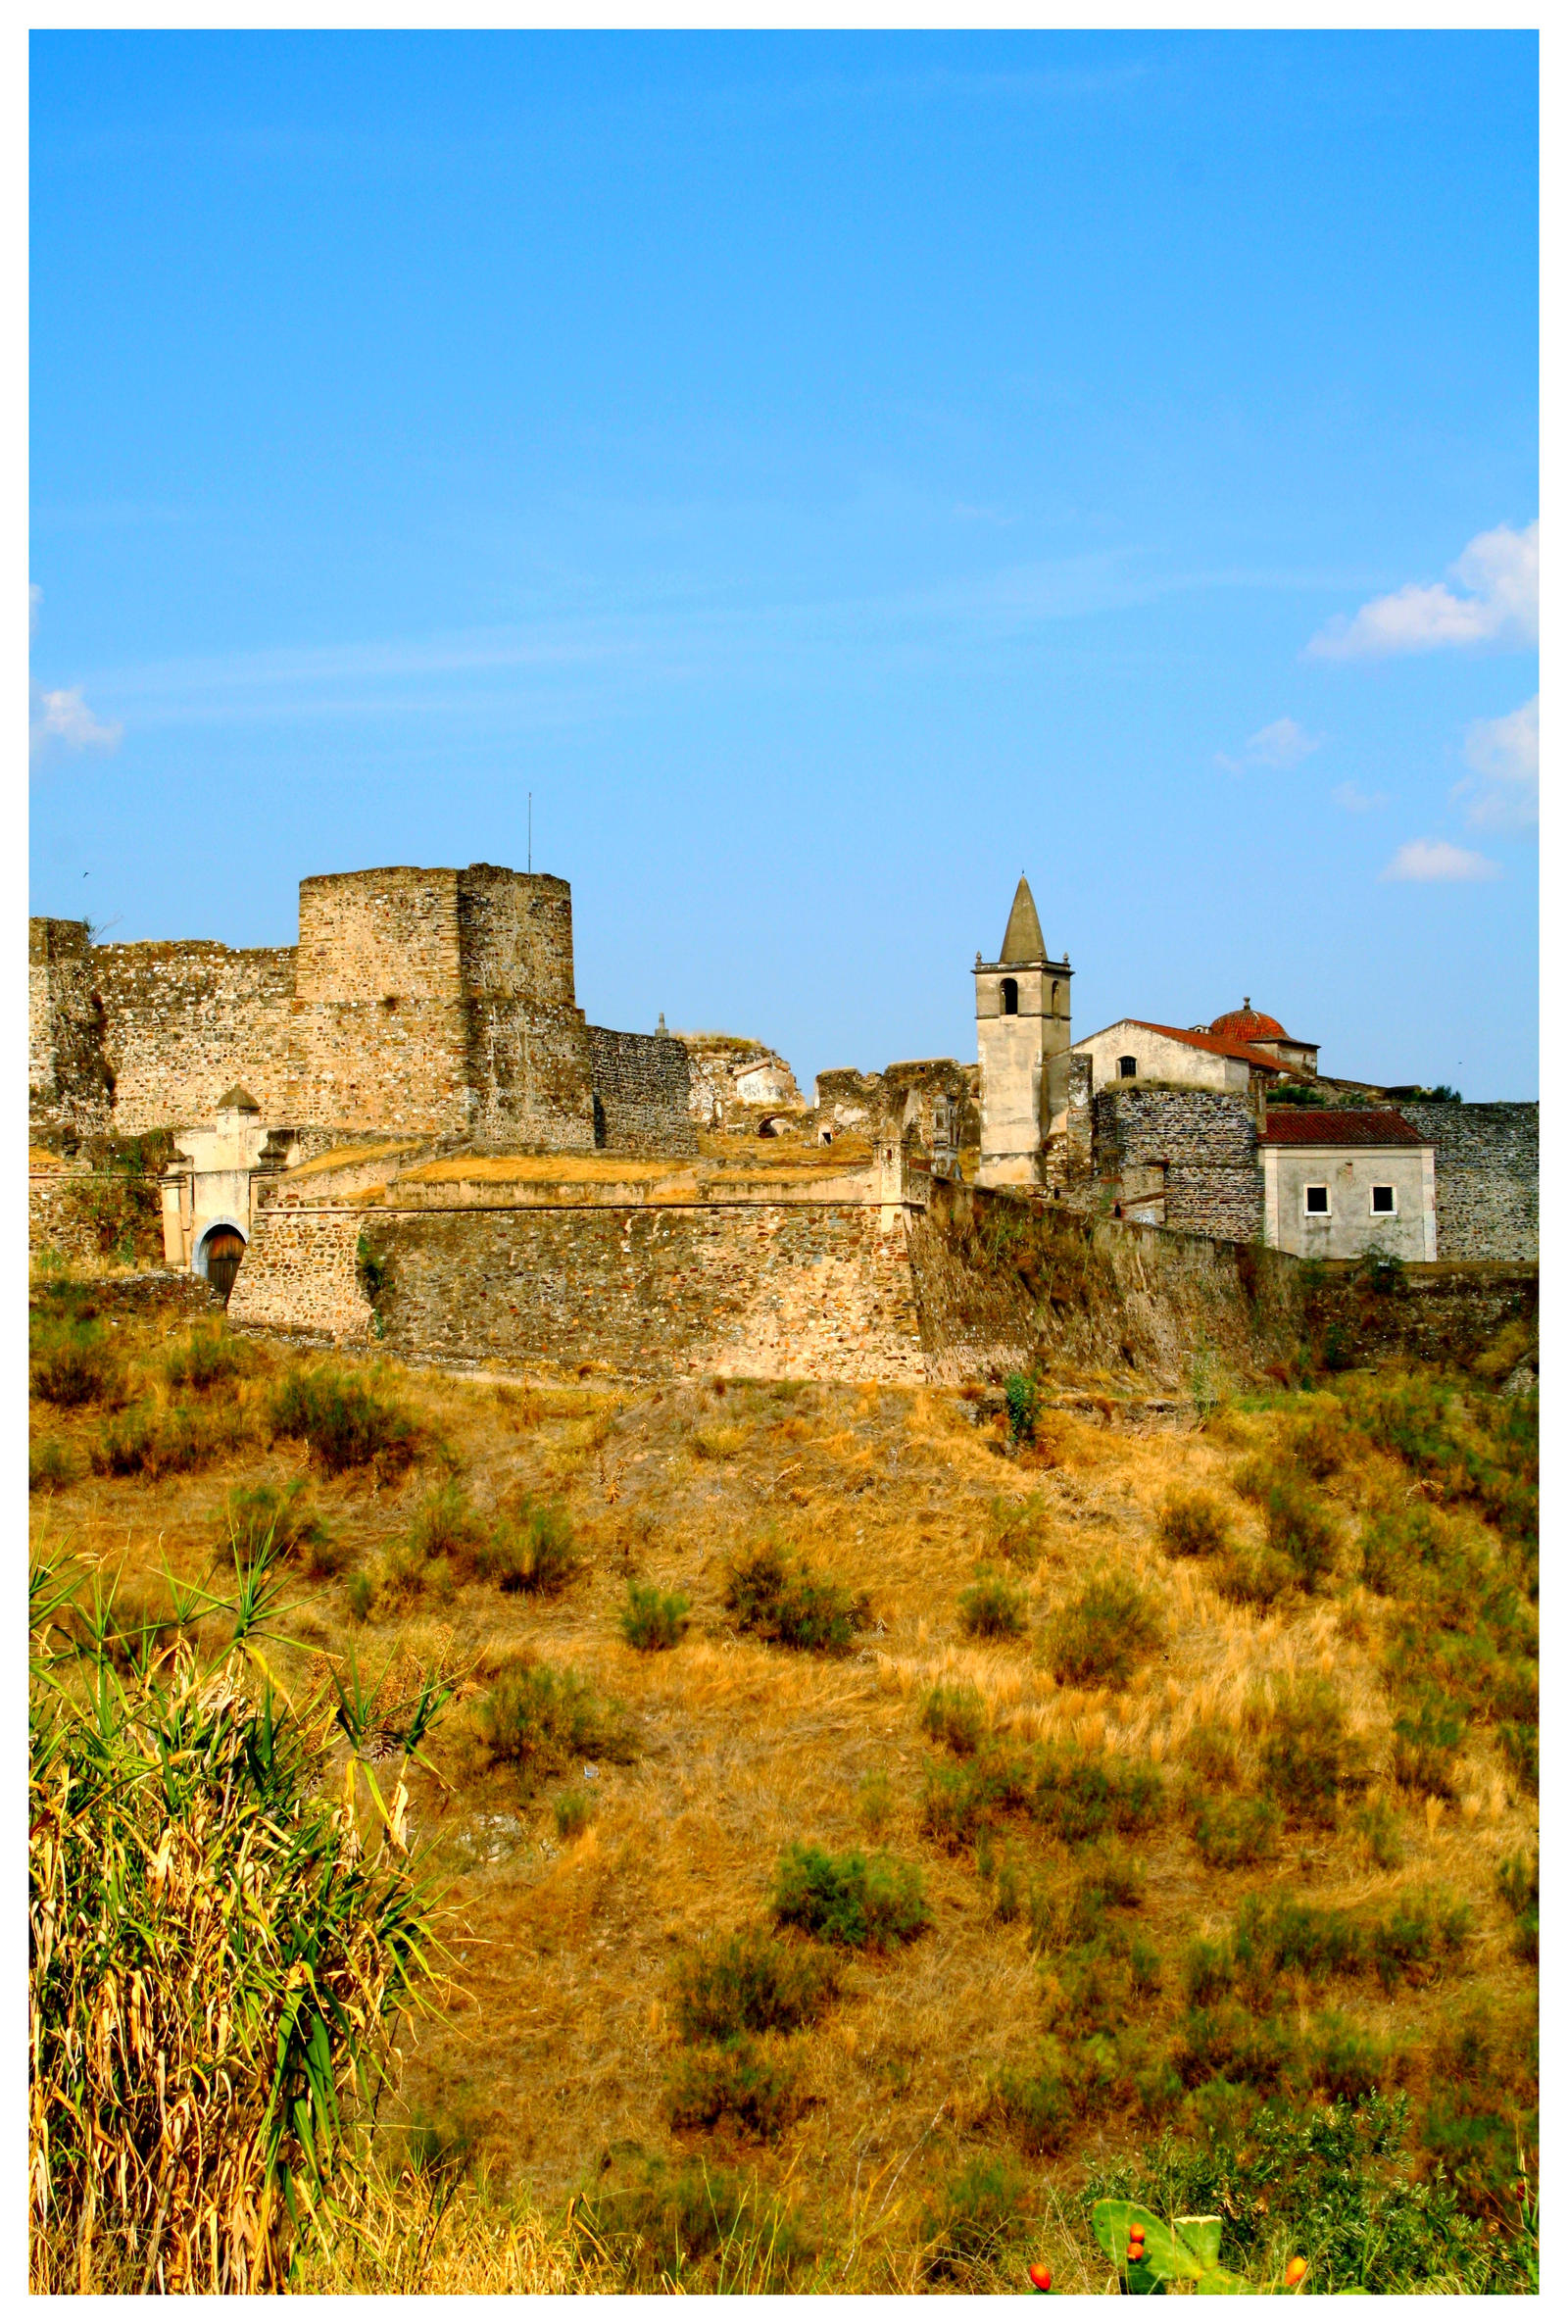 Juromenha Fortress III by FilipaGrilo